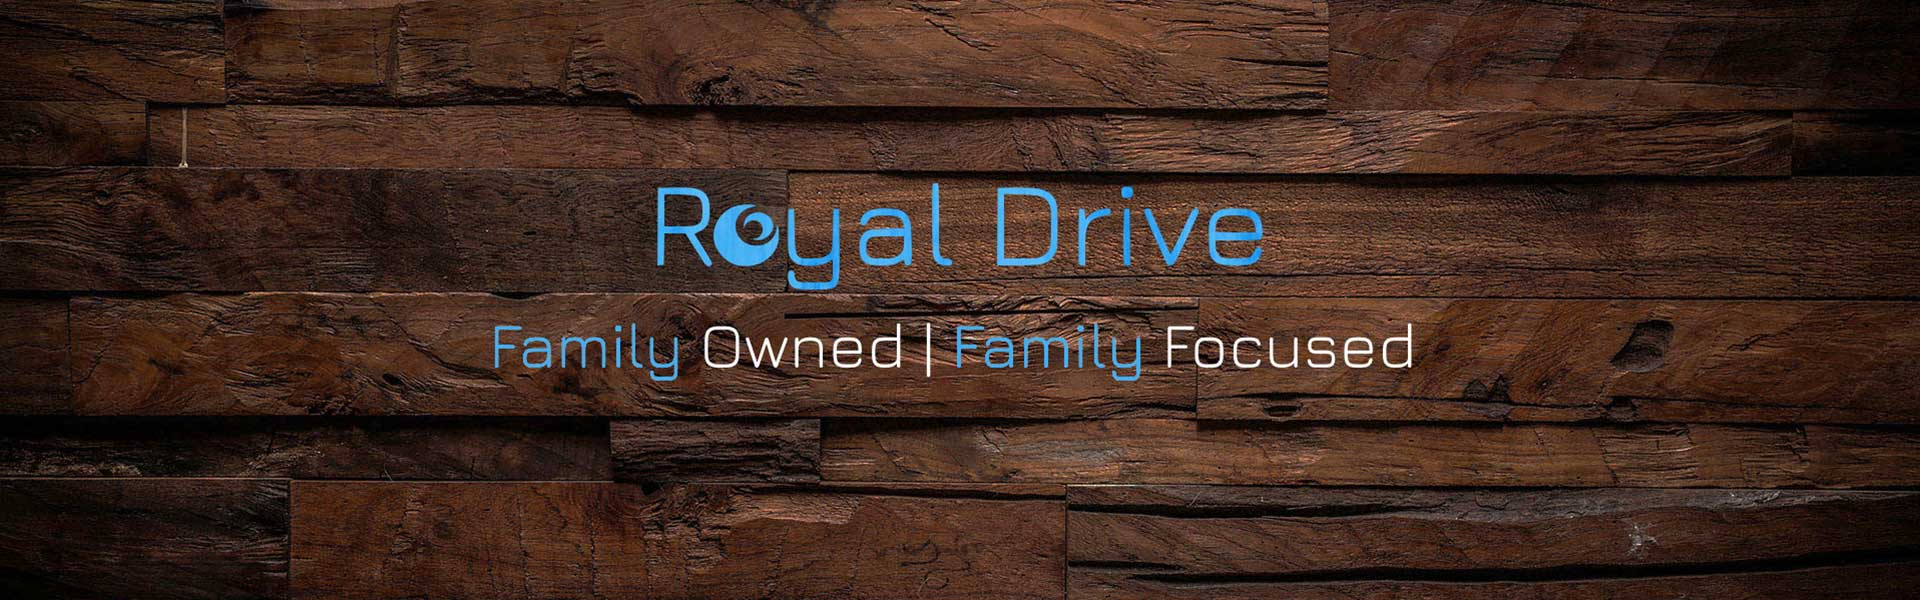 Royal Drive